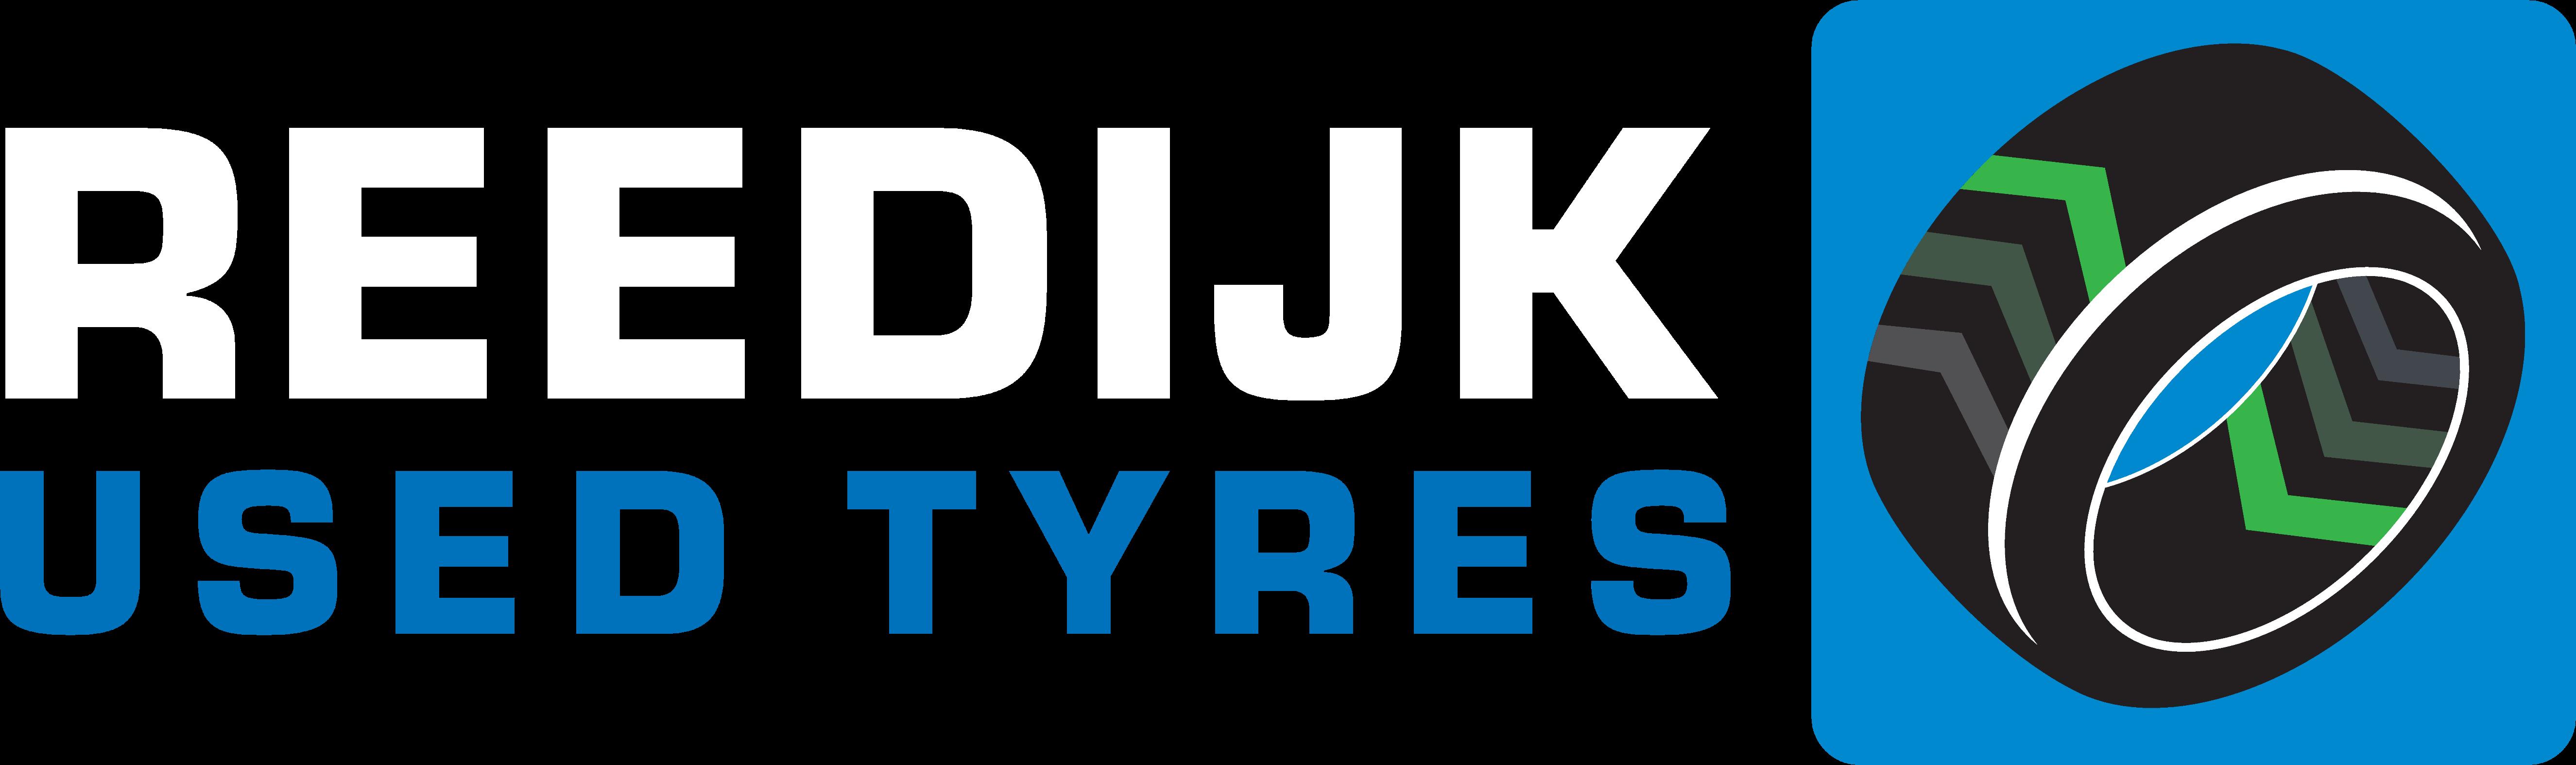 Reedijk Used Tyres Logo